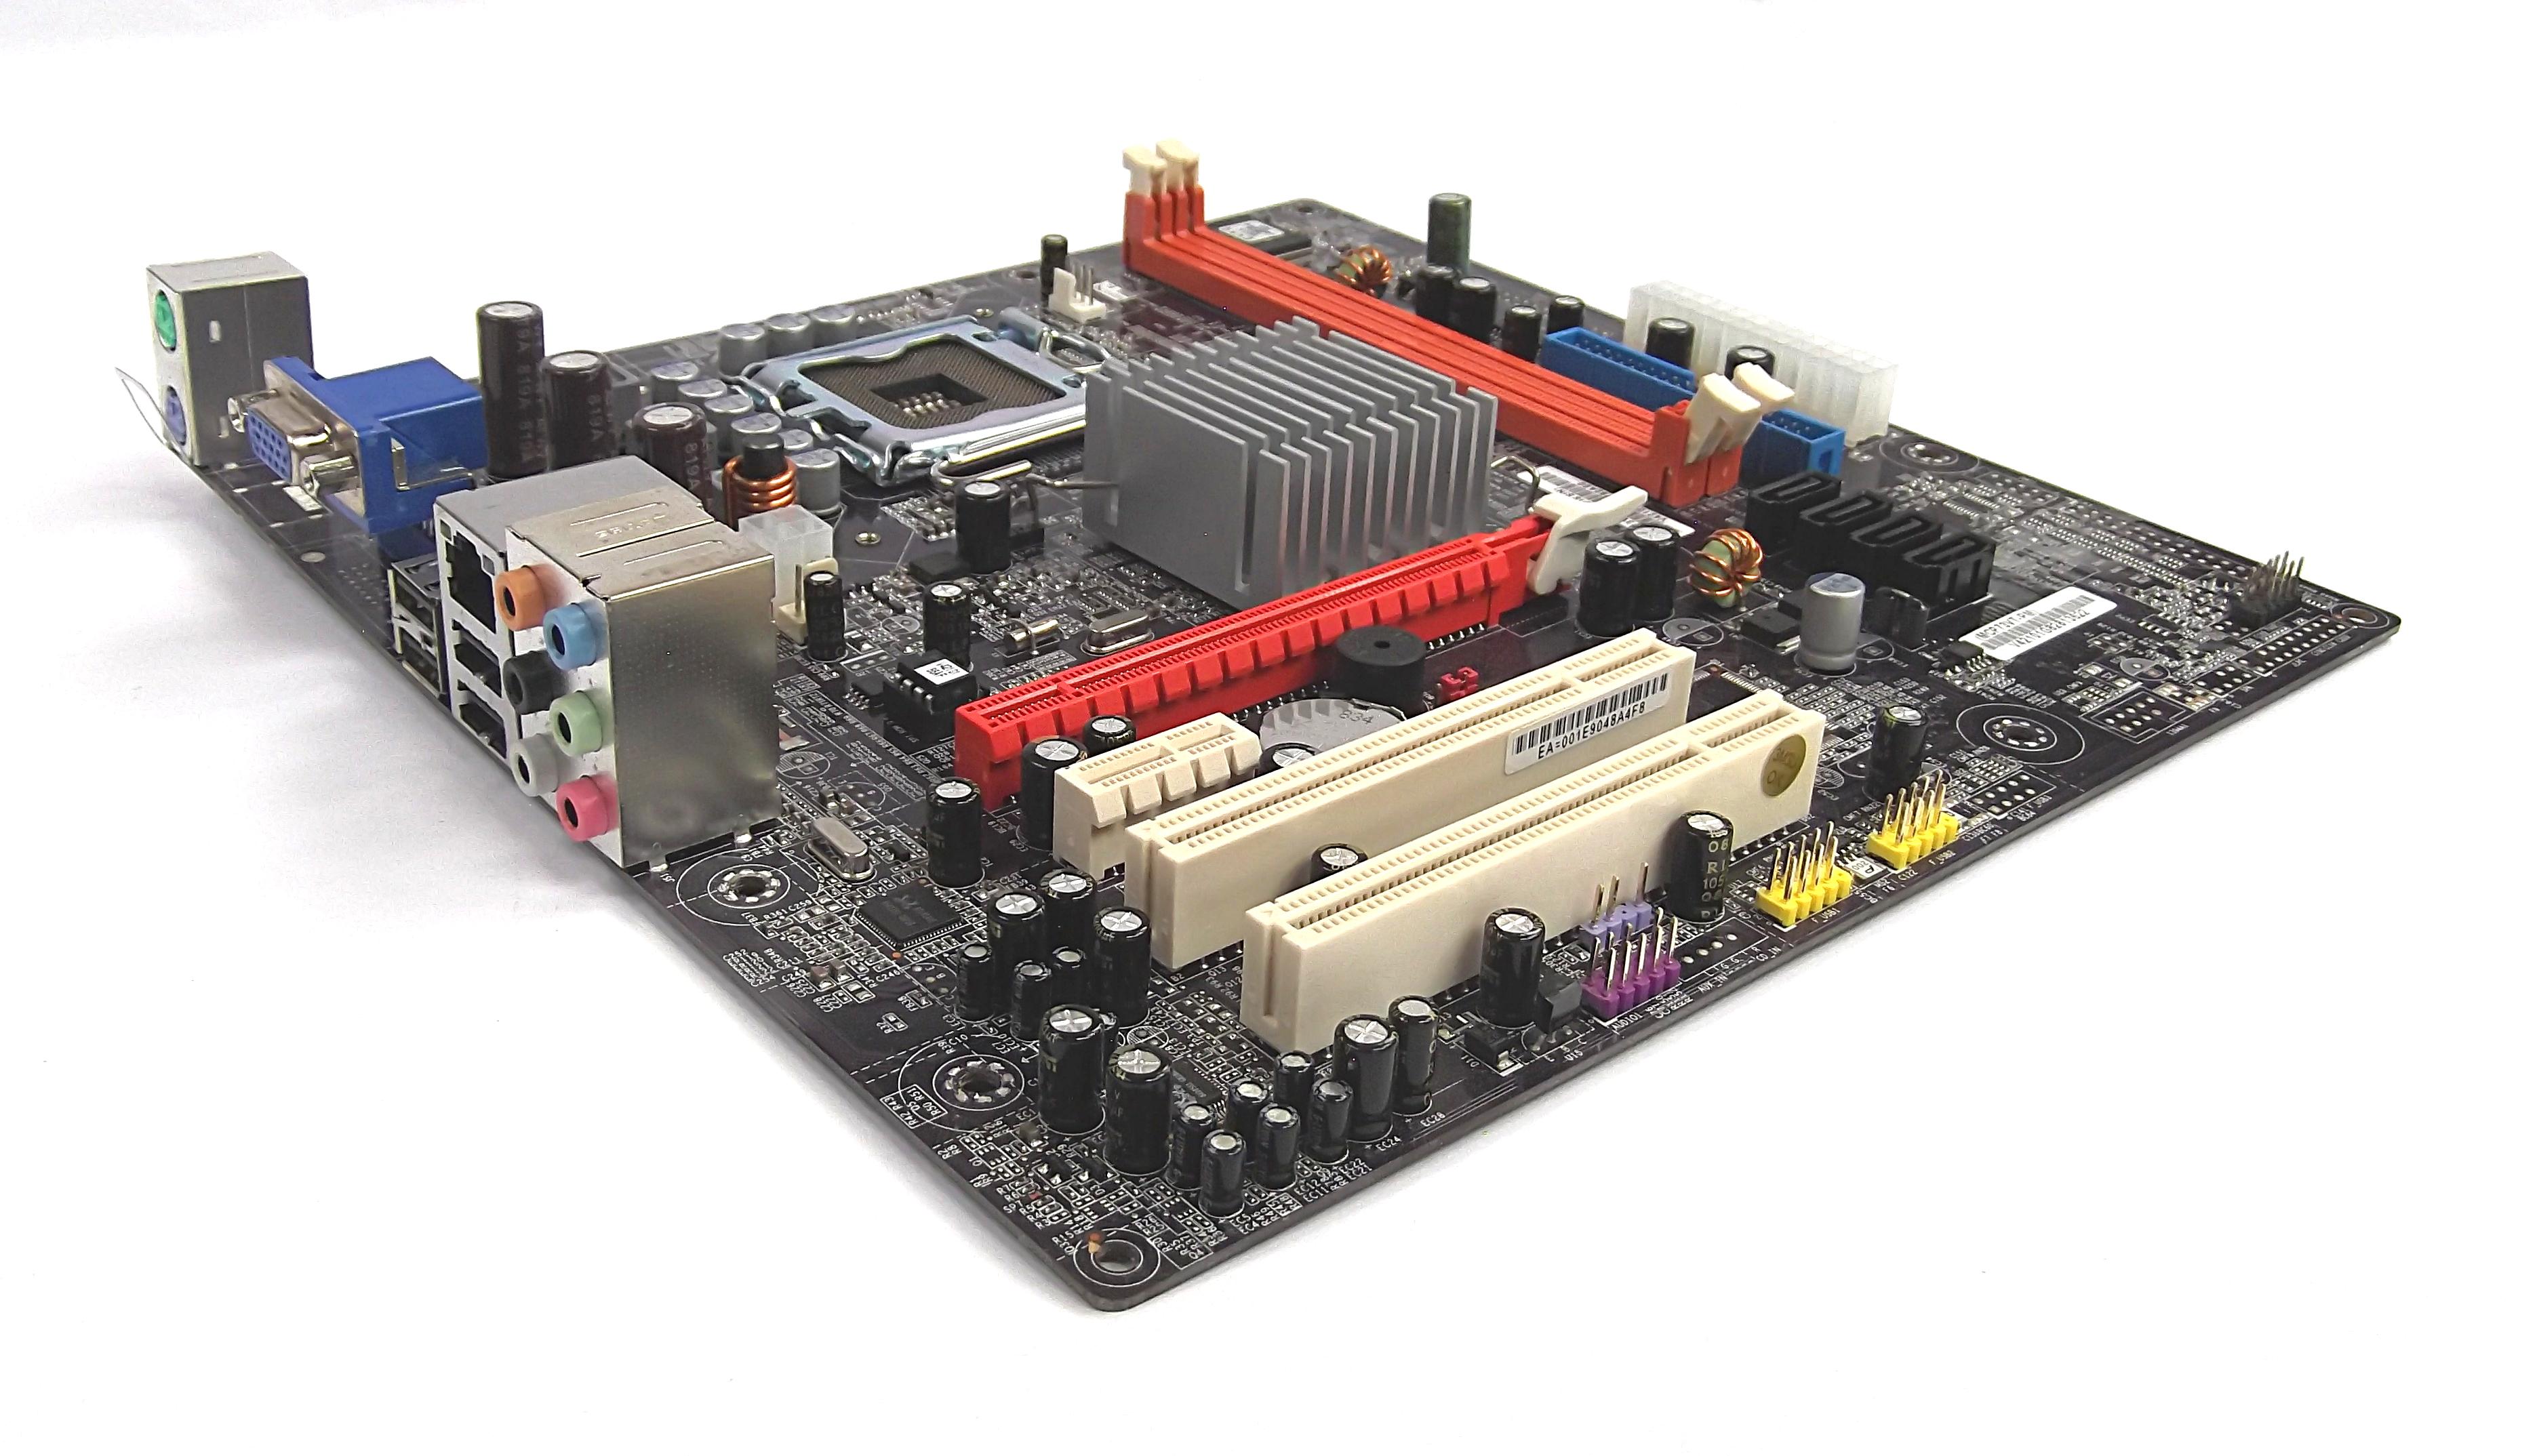 MCP73VT-PM Packard Bell iMedia X2415 Socket 775 Motherboard